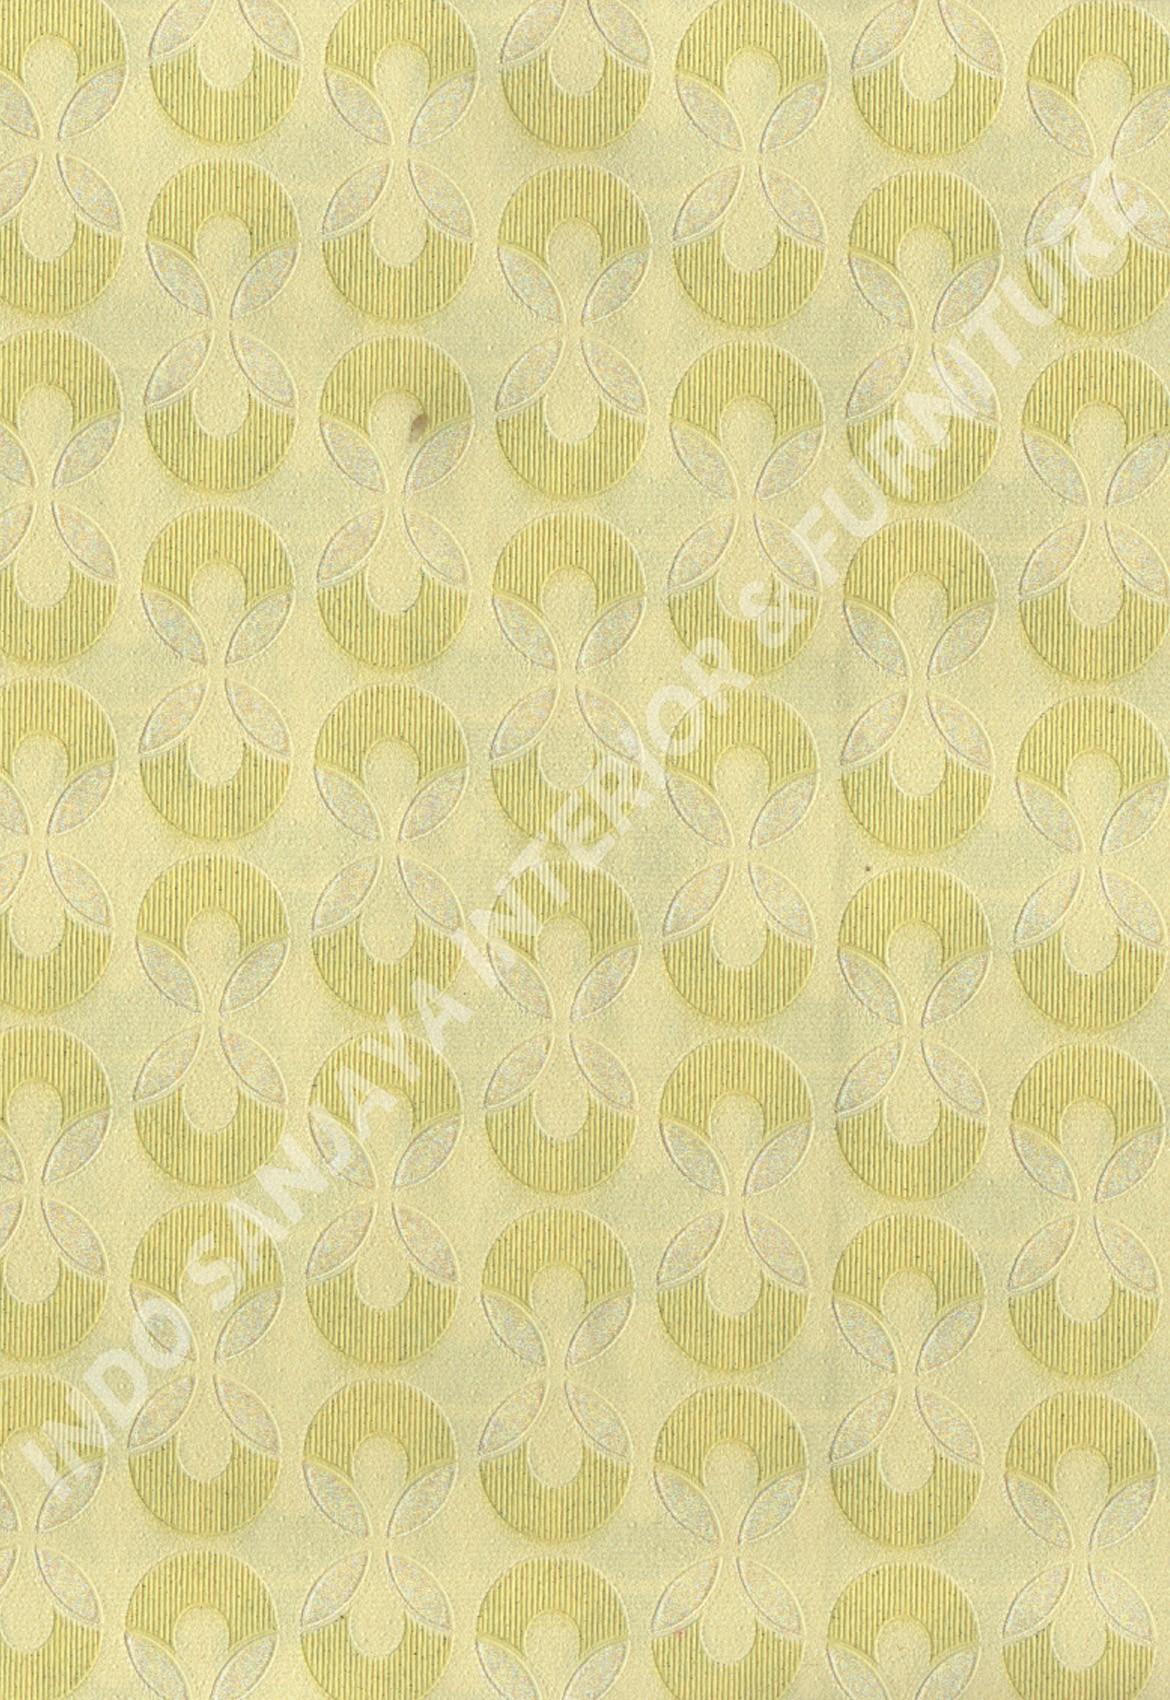 wallpaper   Wallpaper Bulat Geometri E11305:E11305 corak  warna